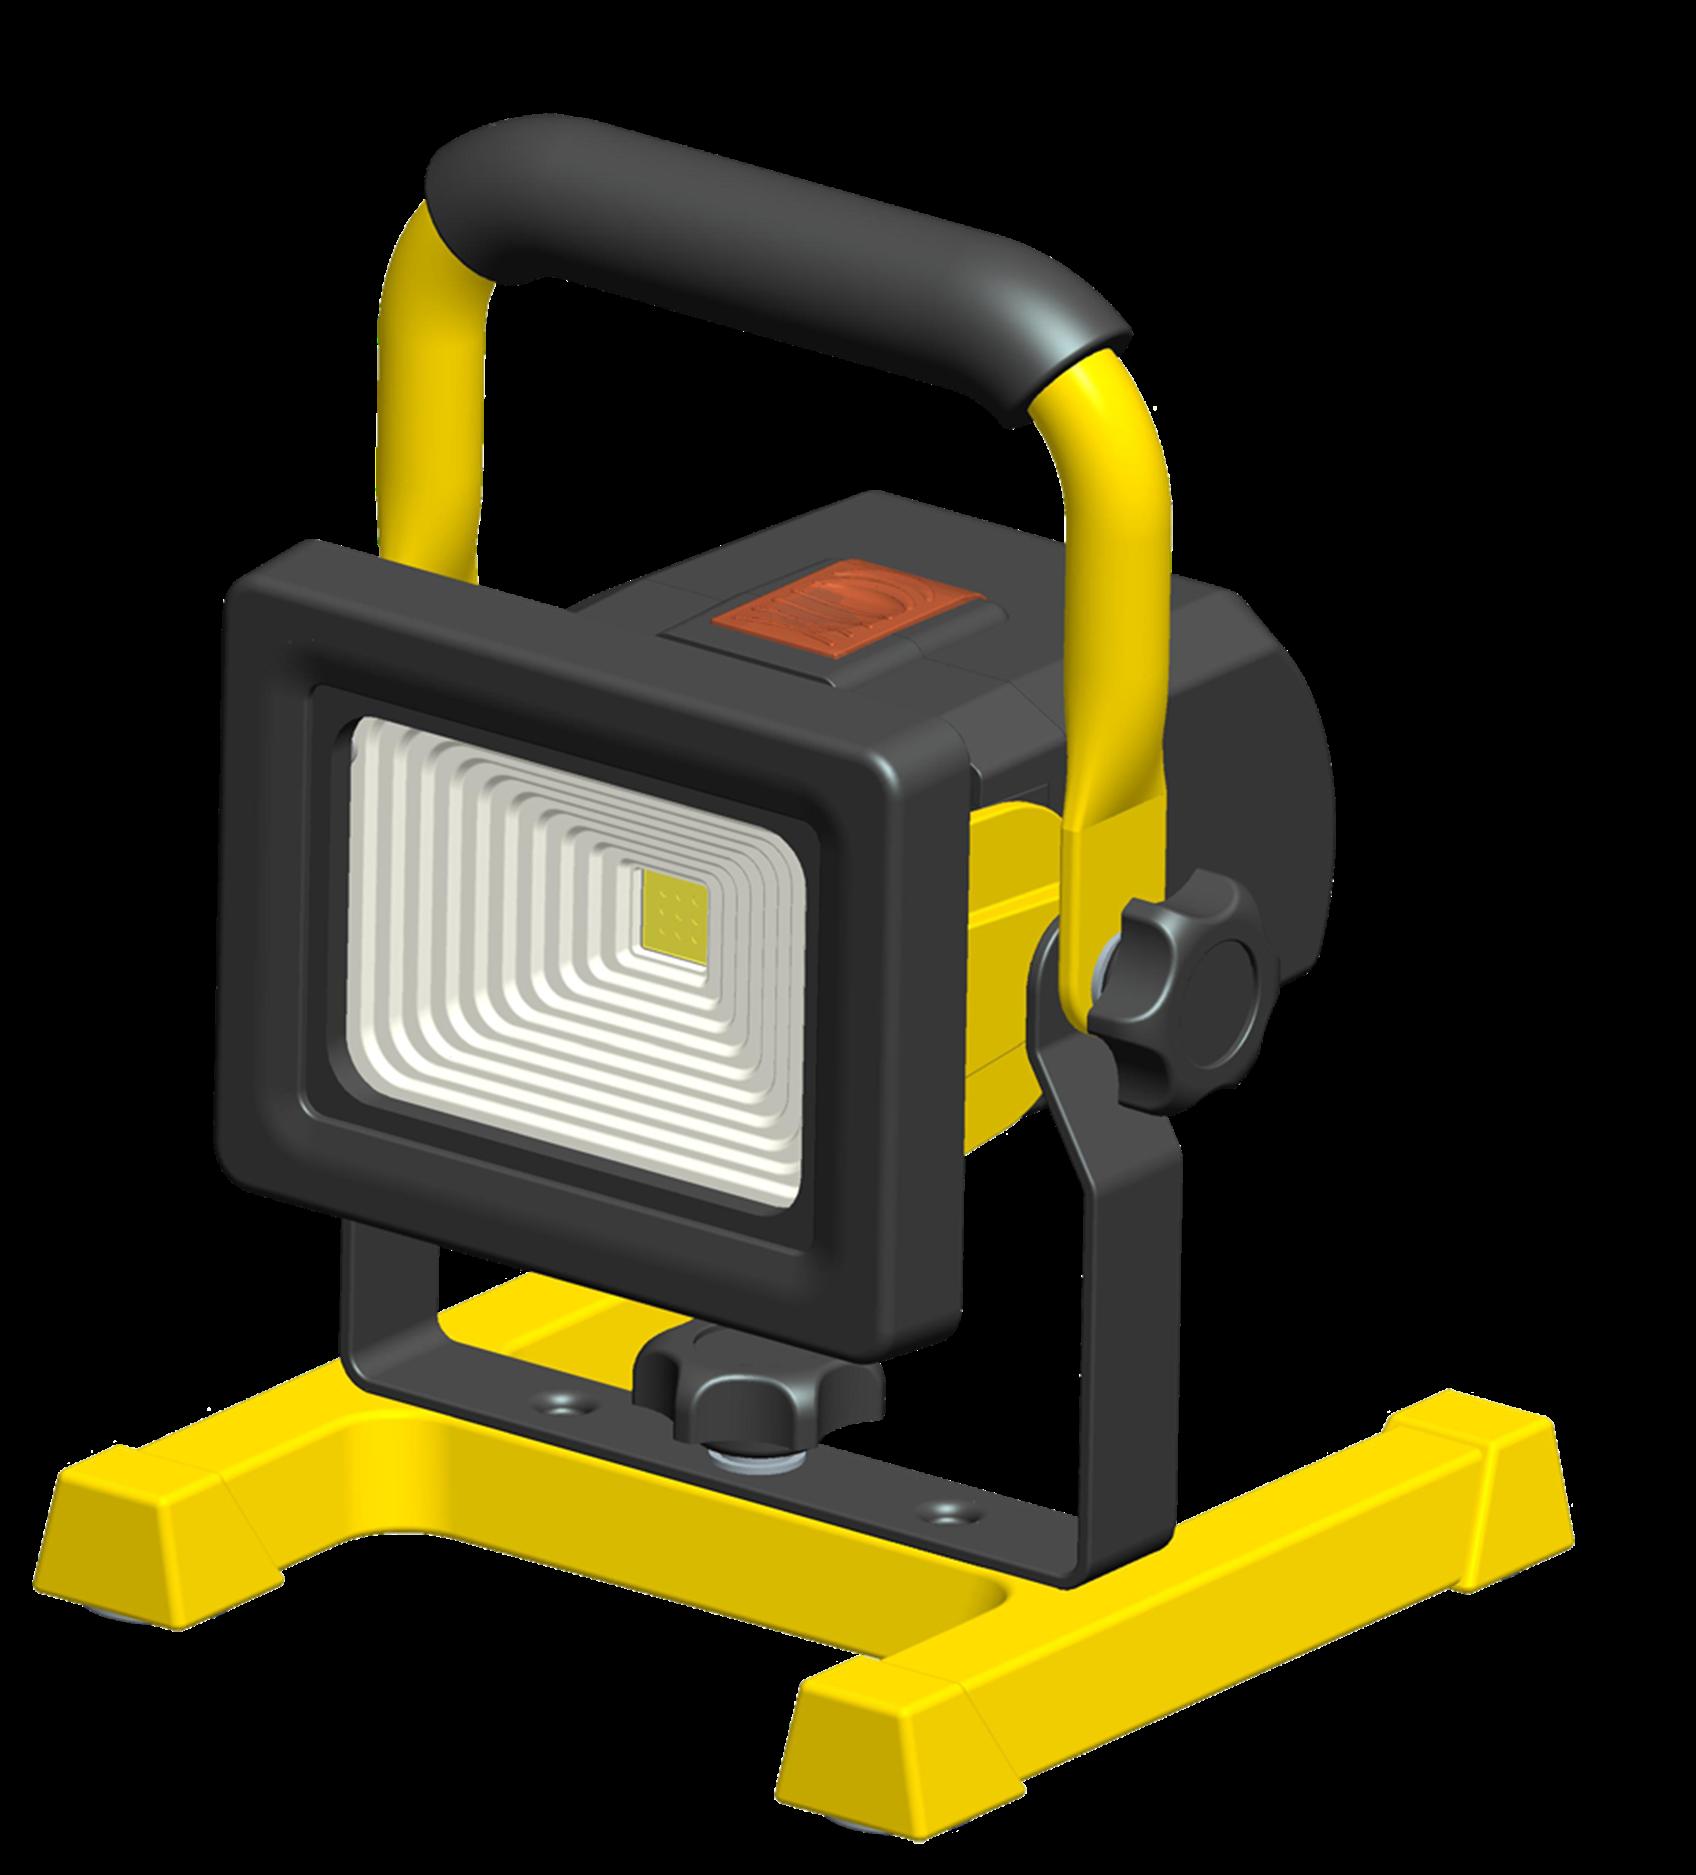 Reflektor G21 LED přenosný bateriový 10W, 700lm, teplá bílá, krytí IP65 + doprava zdarma